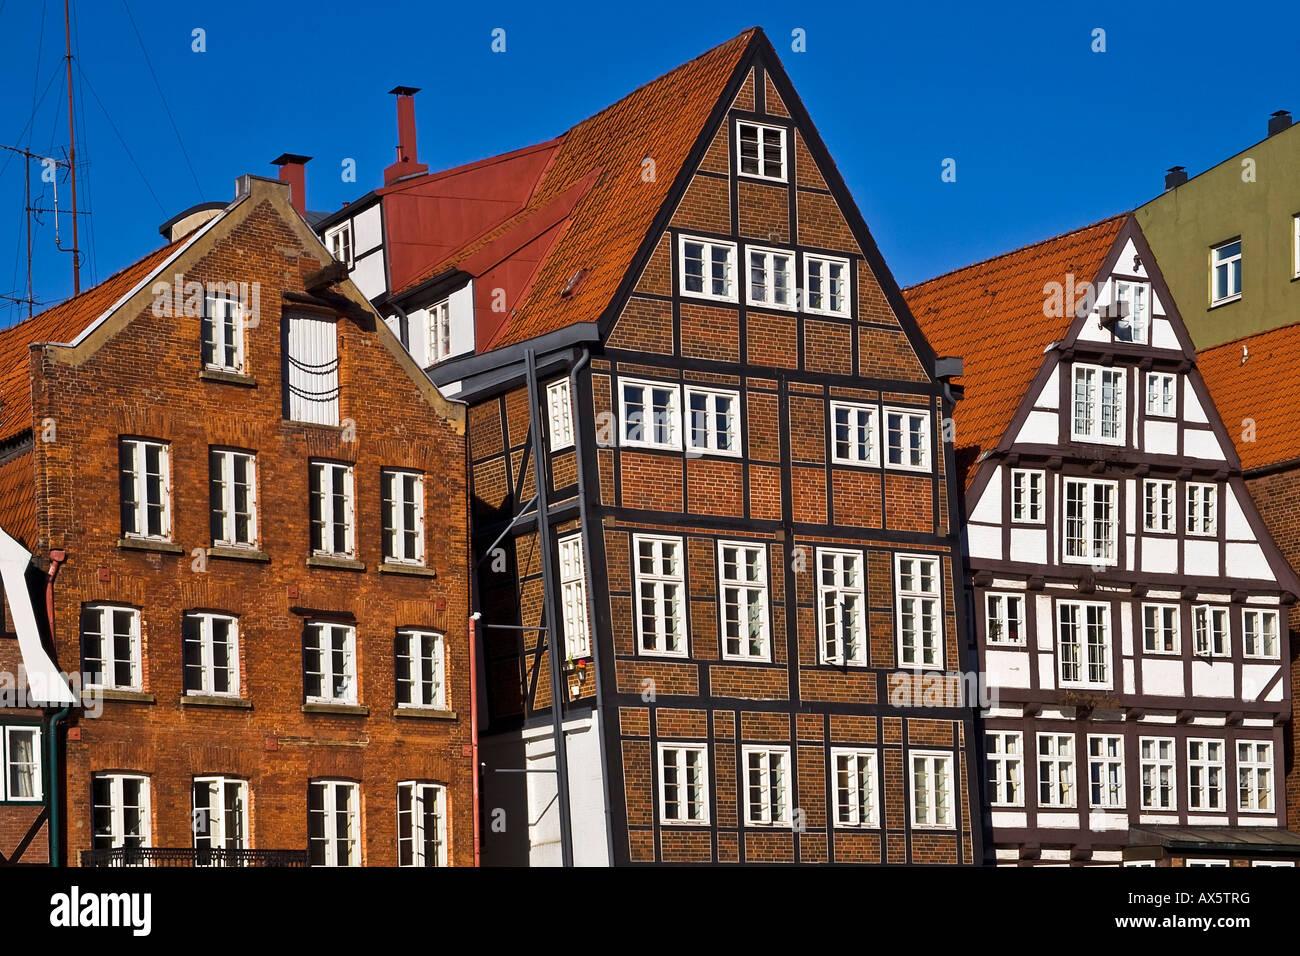 Historic timber-framed houses in Hamburg, Deichstrasse, Nikolaifleet, Altstadt district, Hamburg, Germany, Europe - Stock Image